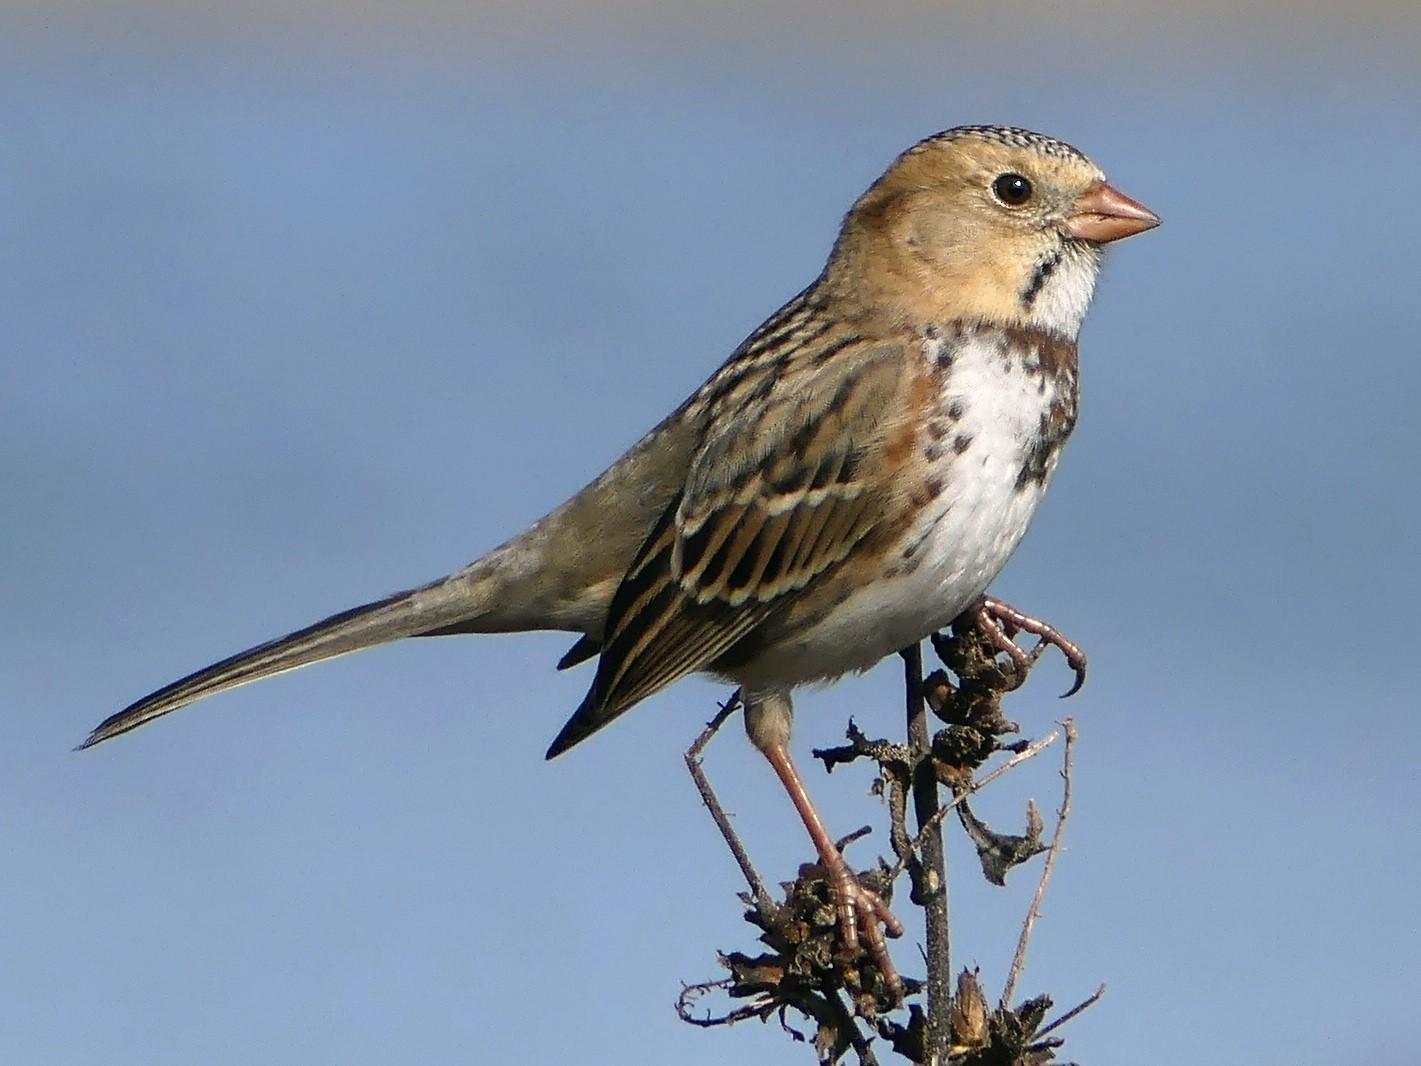 Harris's Sparrow - Shelley Rutkin